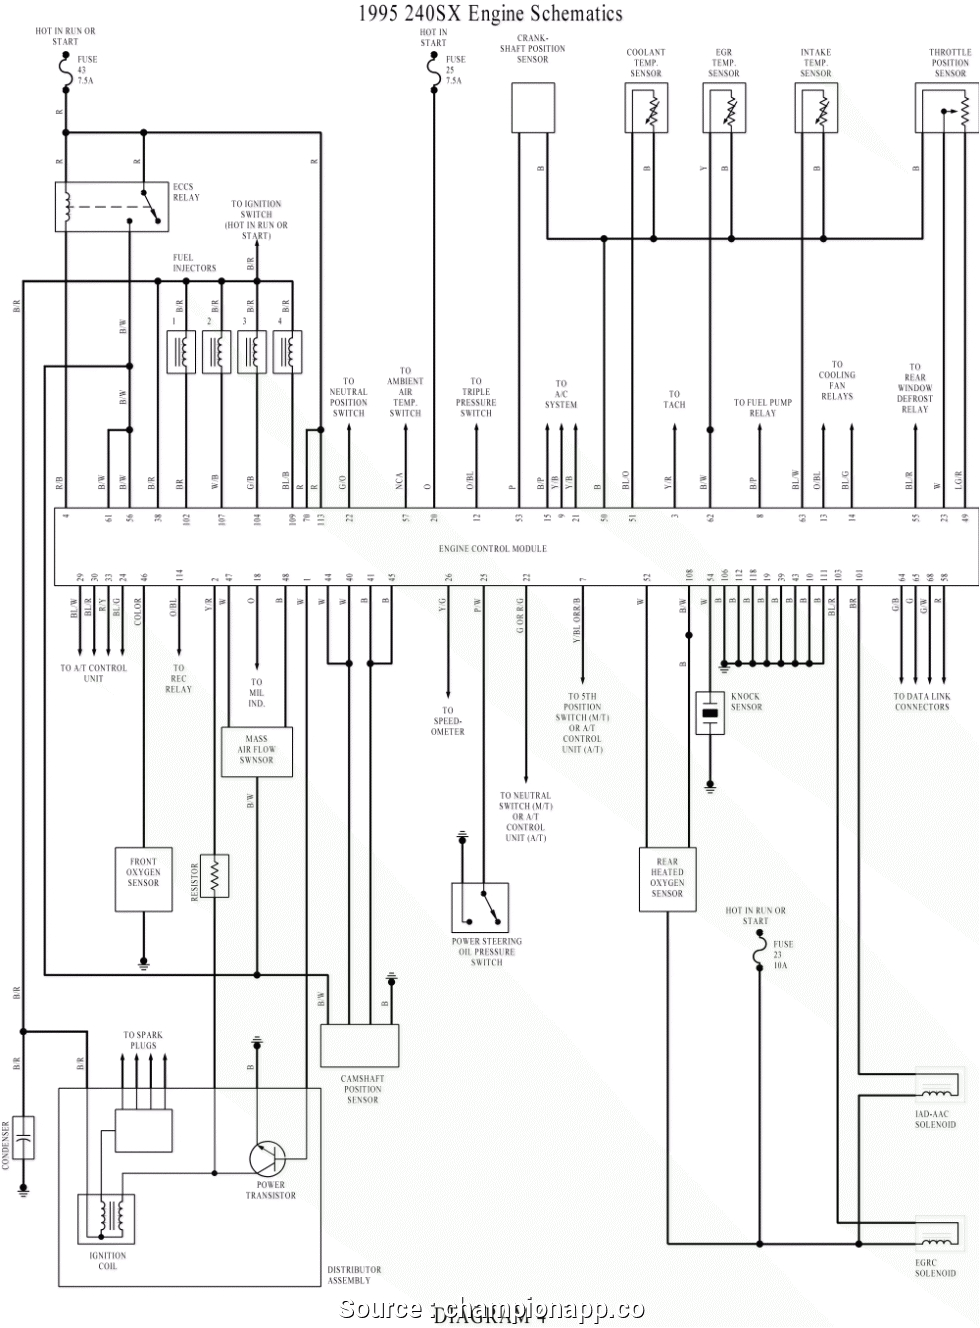 detail 240sx wiring diagram 12775 s13 7 gif